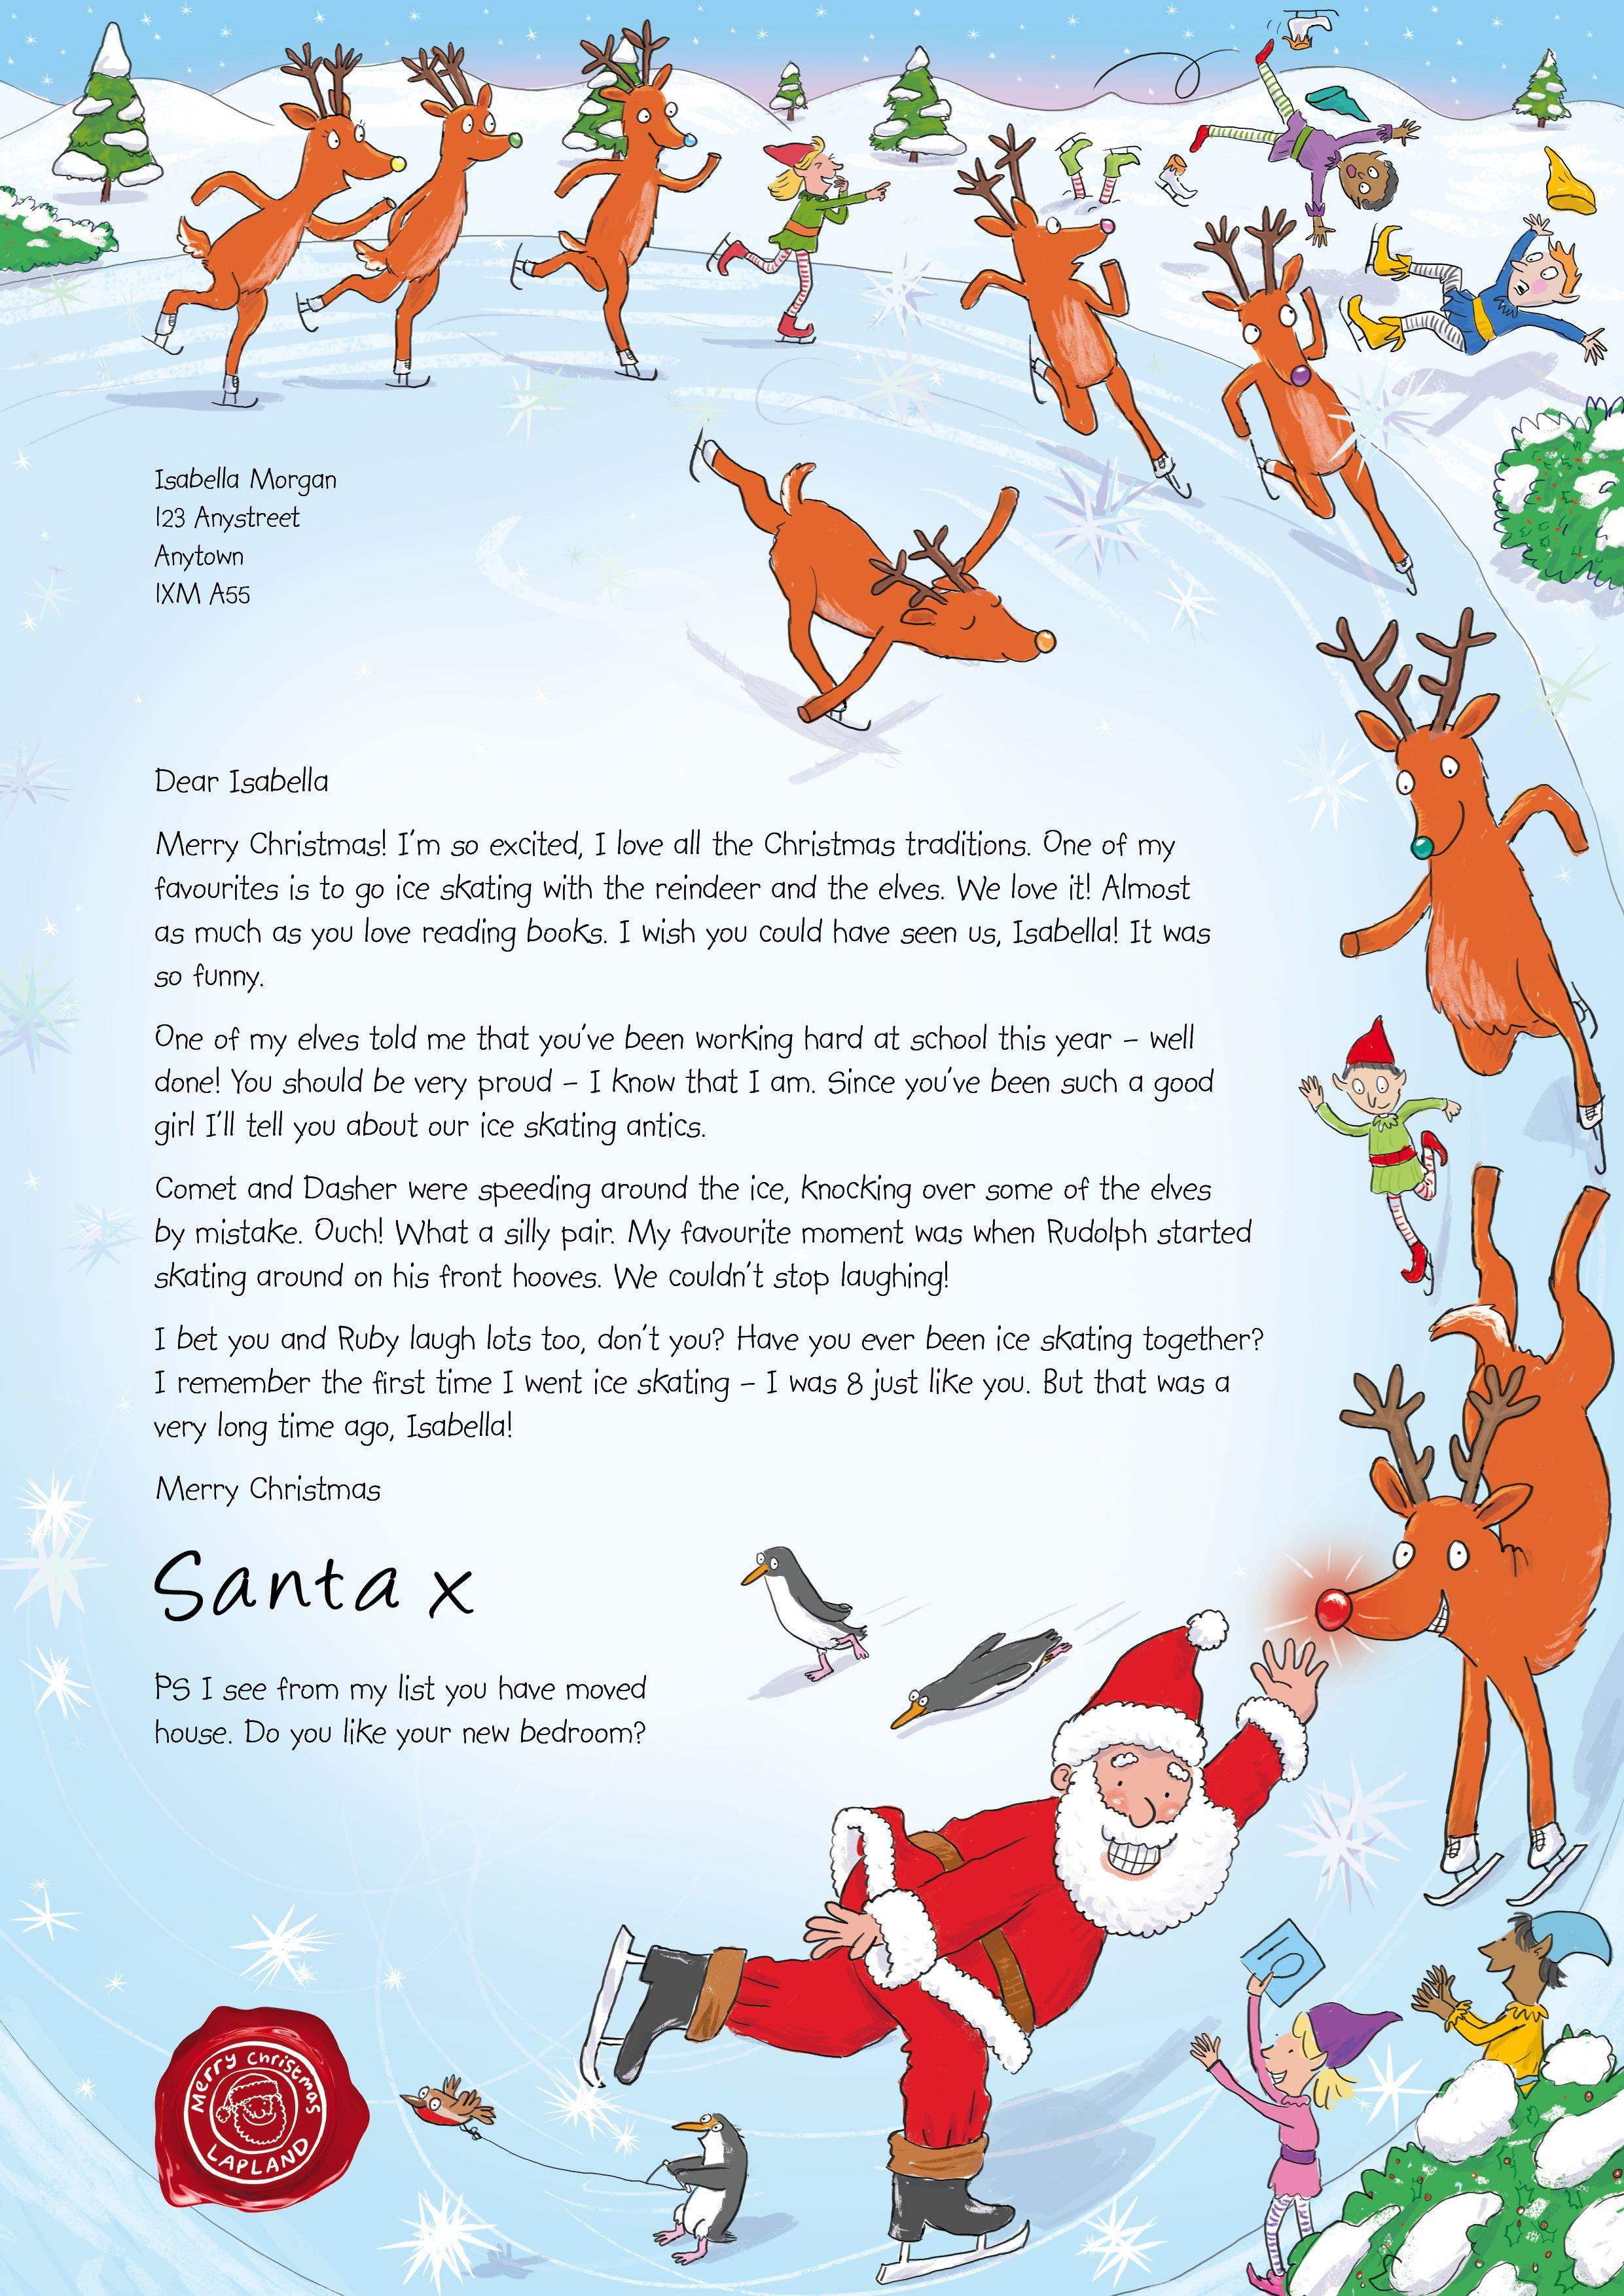 NSPCC Letter from Santa design (December 2014) Santa